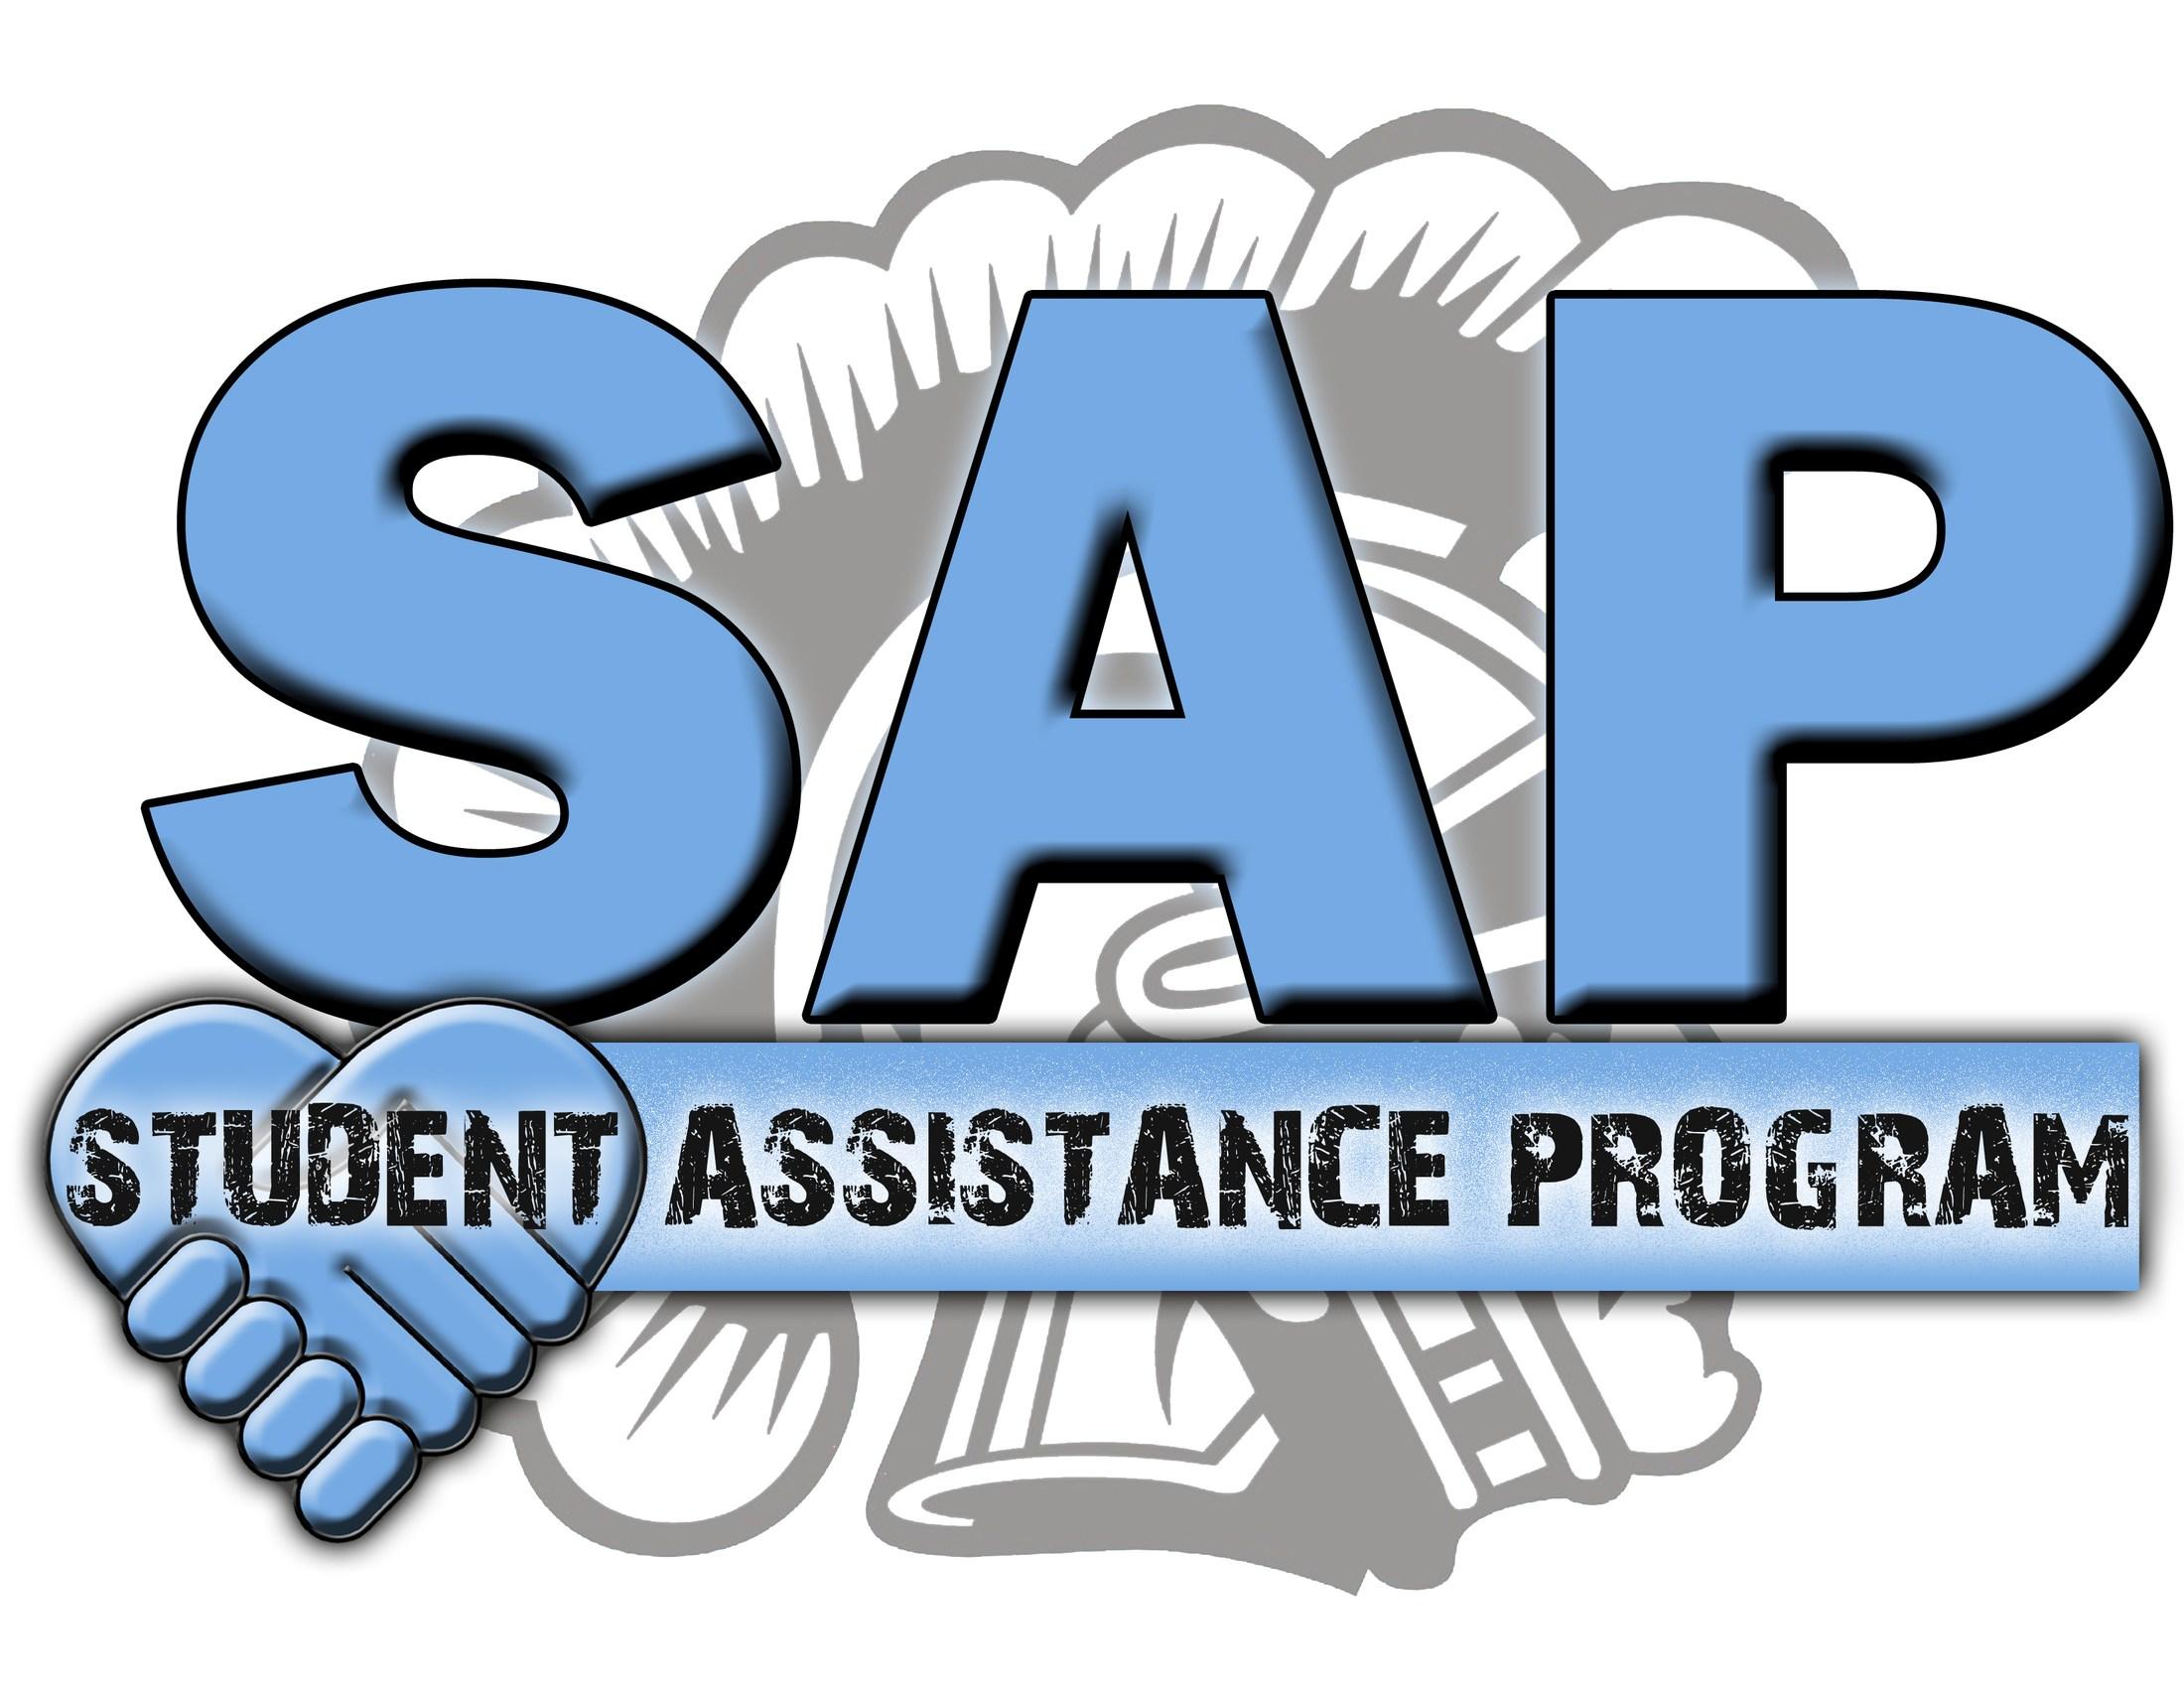 Student Assistance Program Graphic Logo